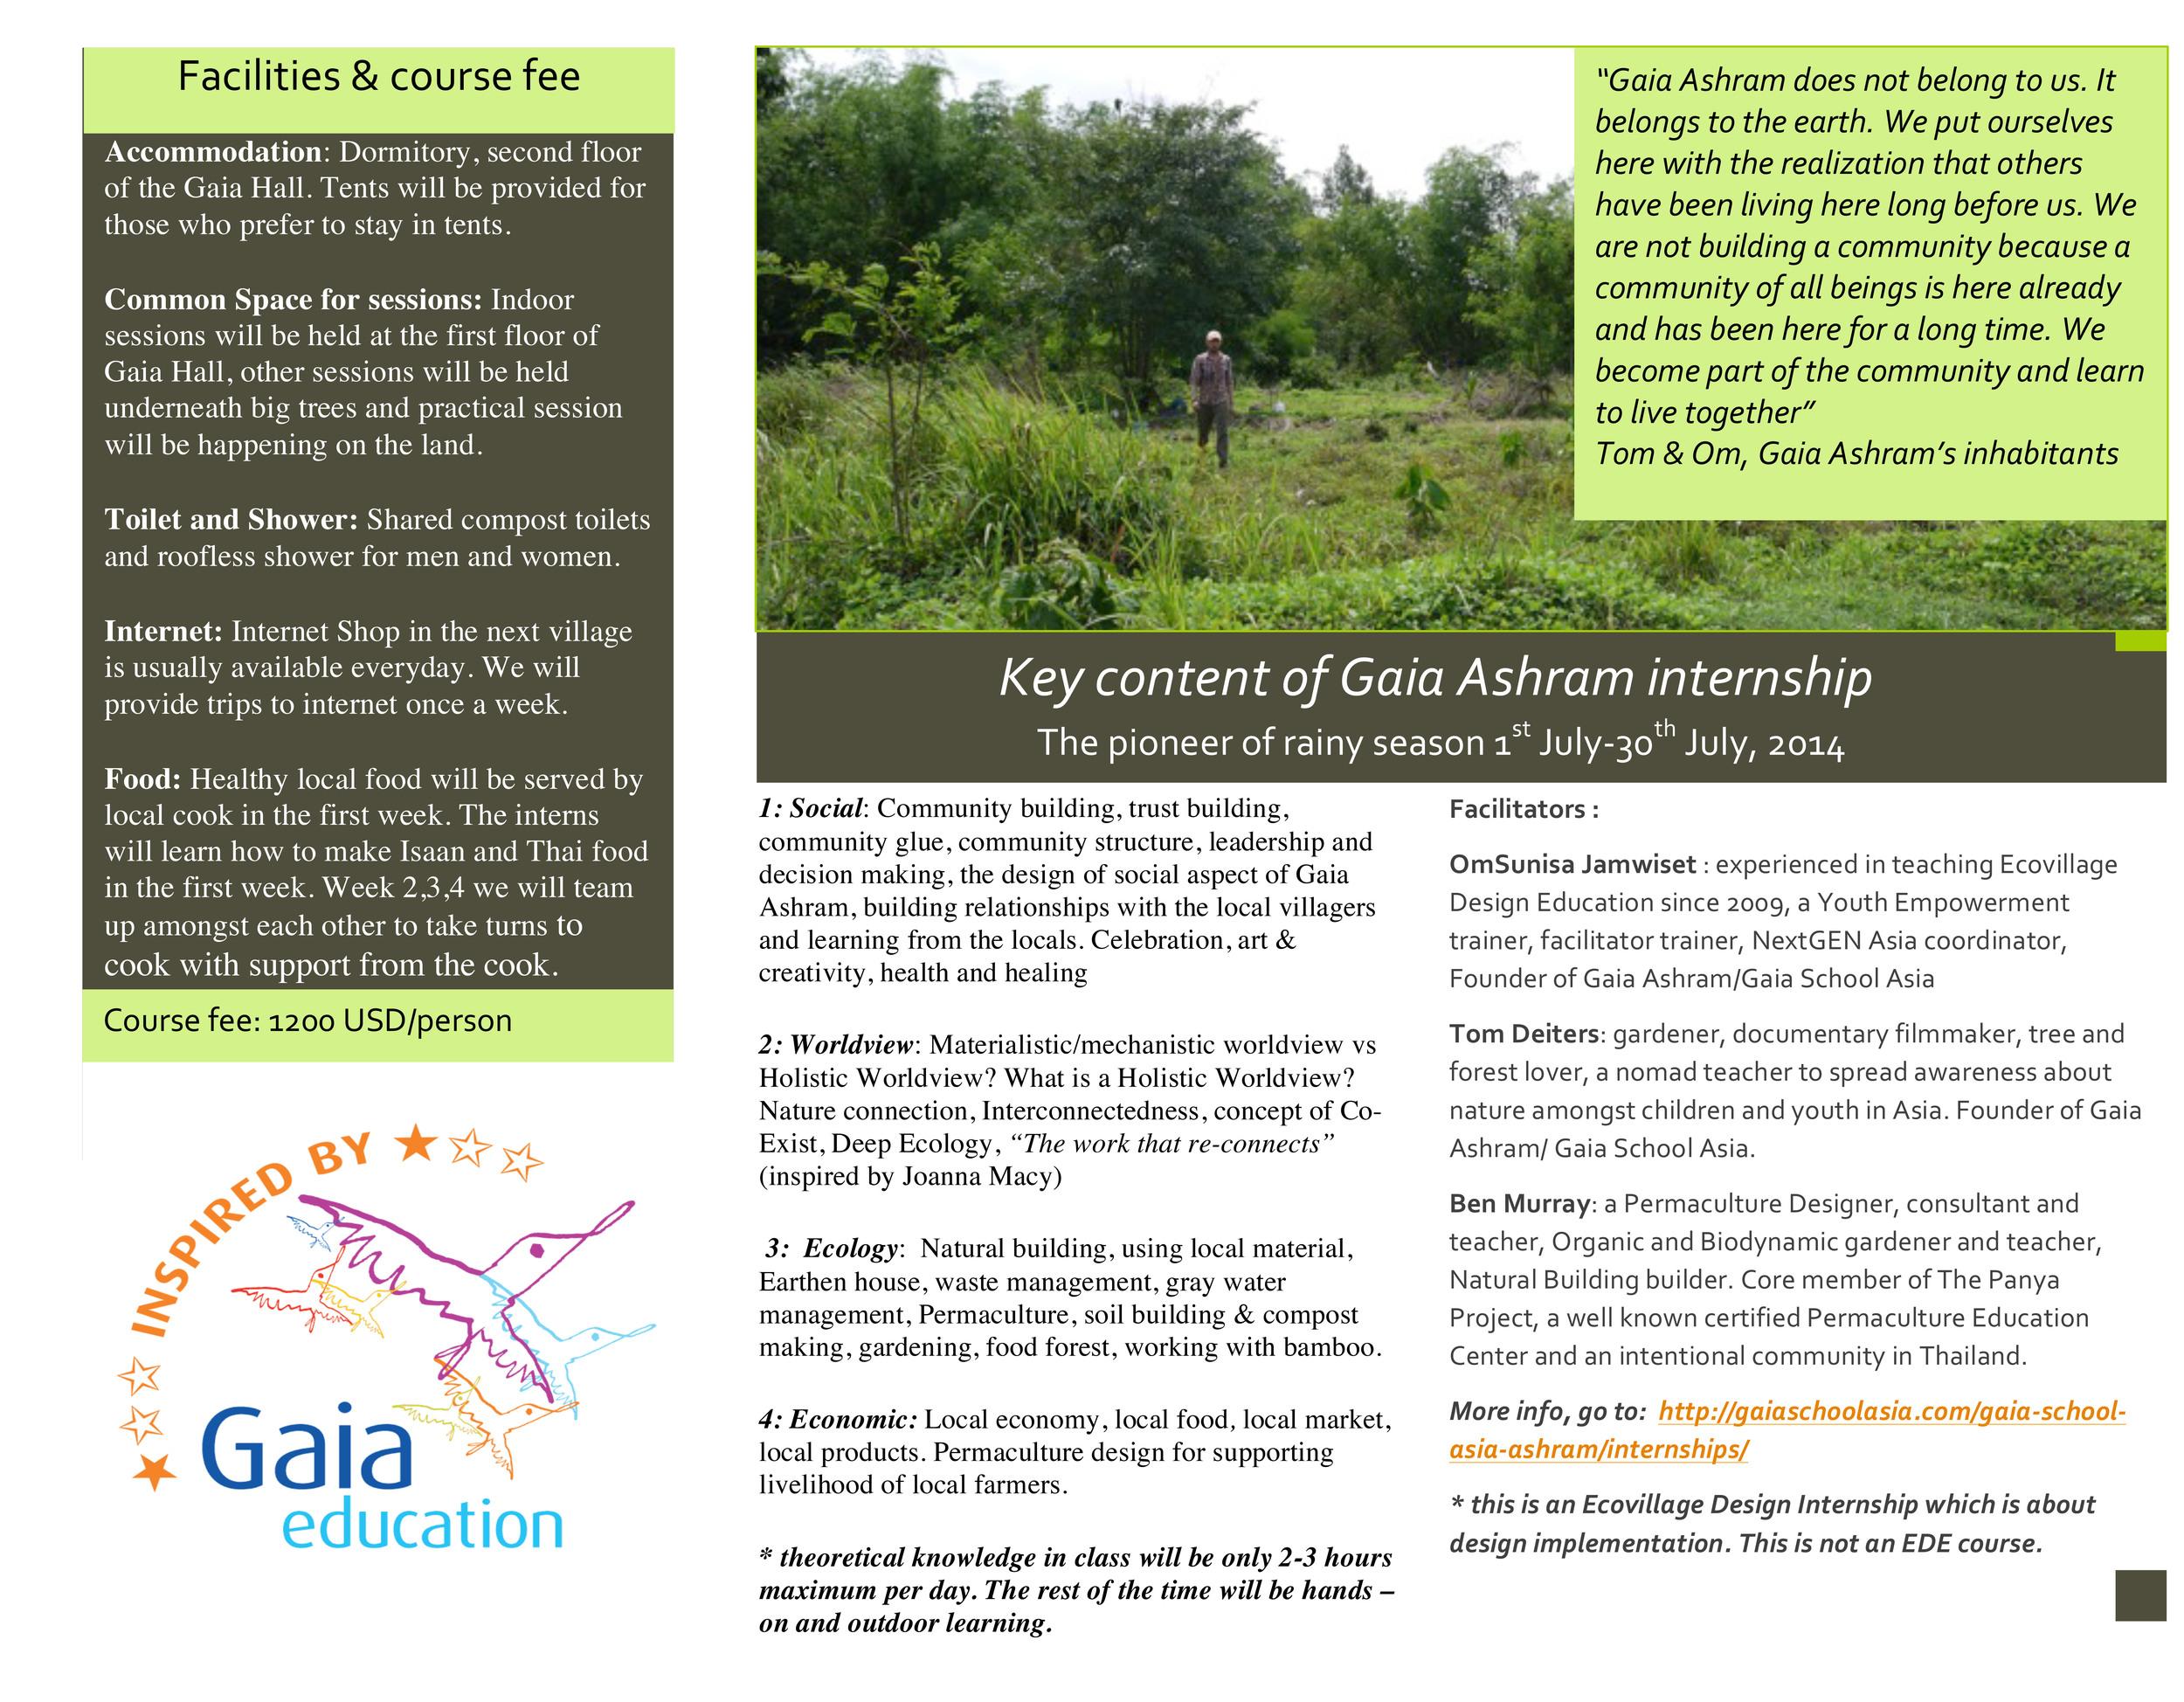 gaia-ashram-internship-2014inspired-by-gaia-education(new)-2.jpg